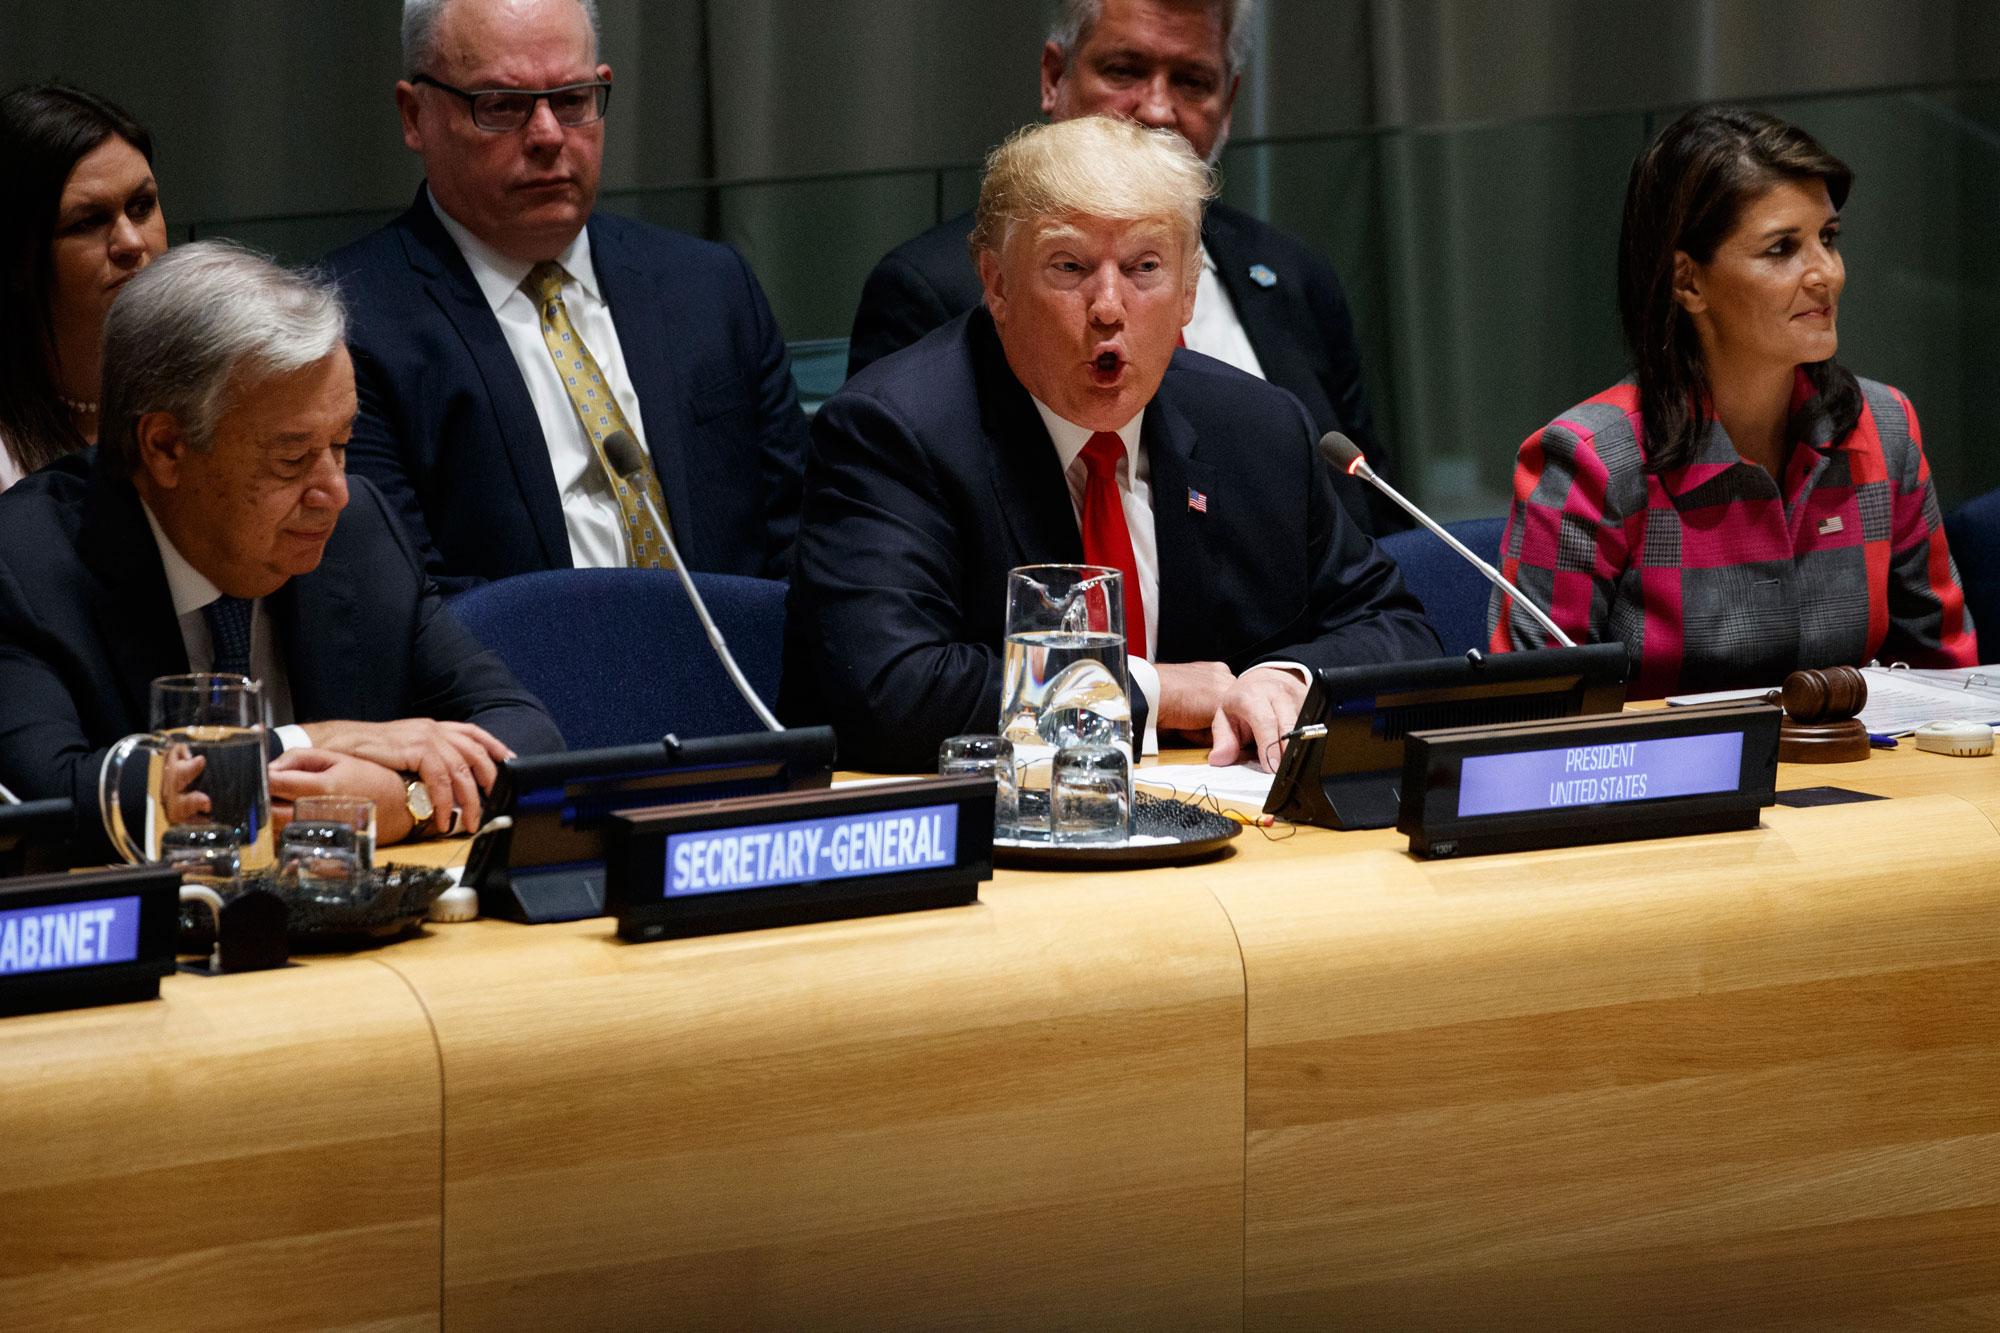 'Rocket Man' to 'Terrific': Trump hints at second meeting with Kim